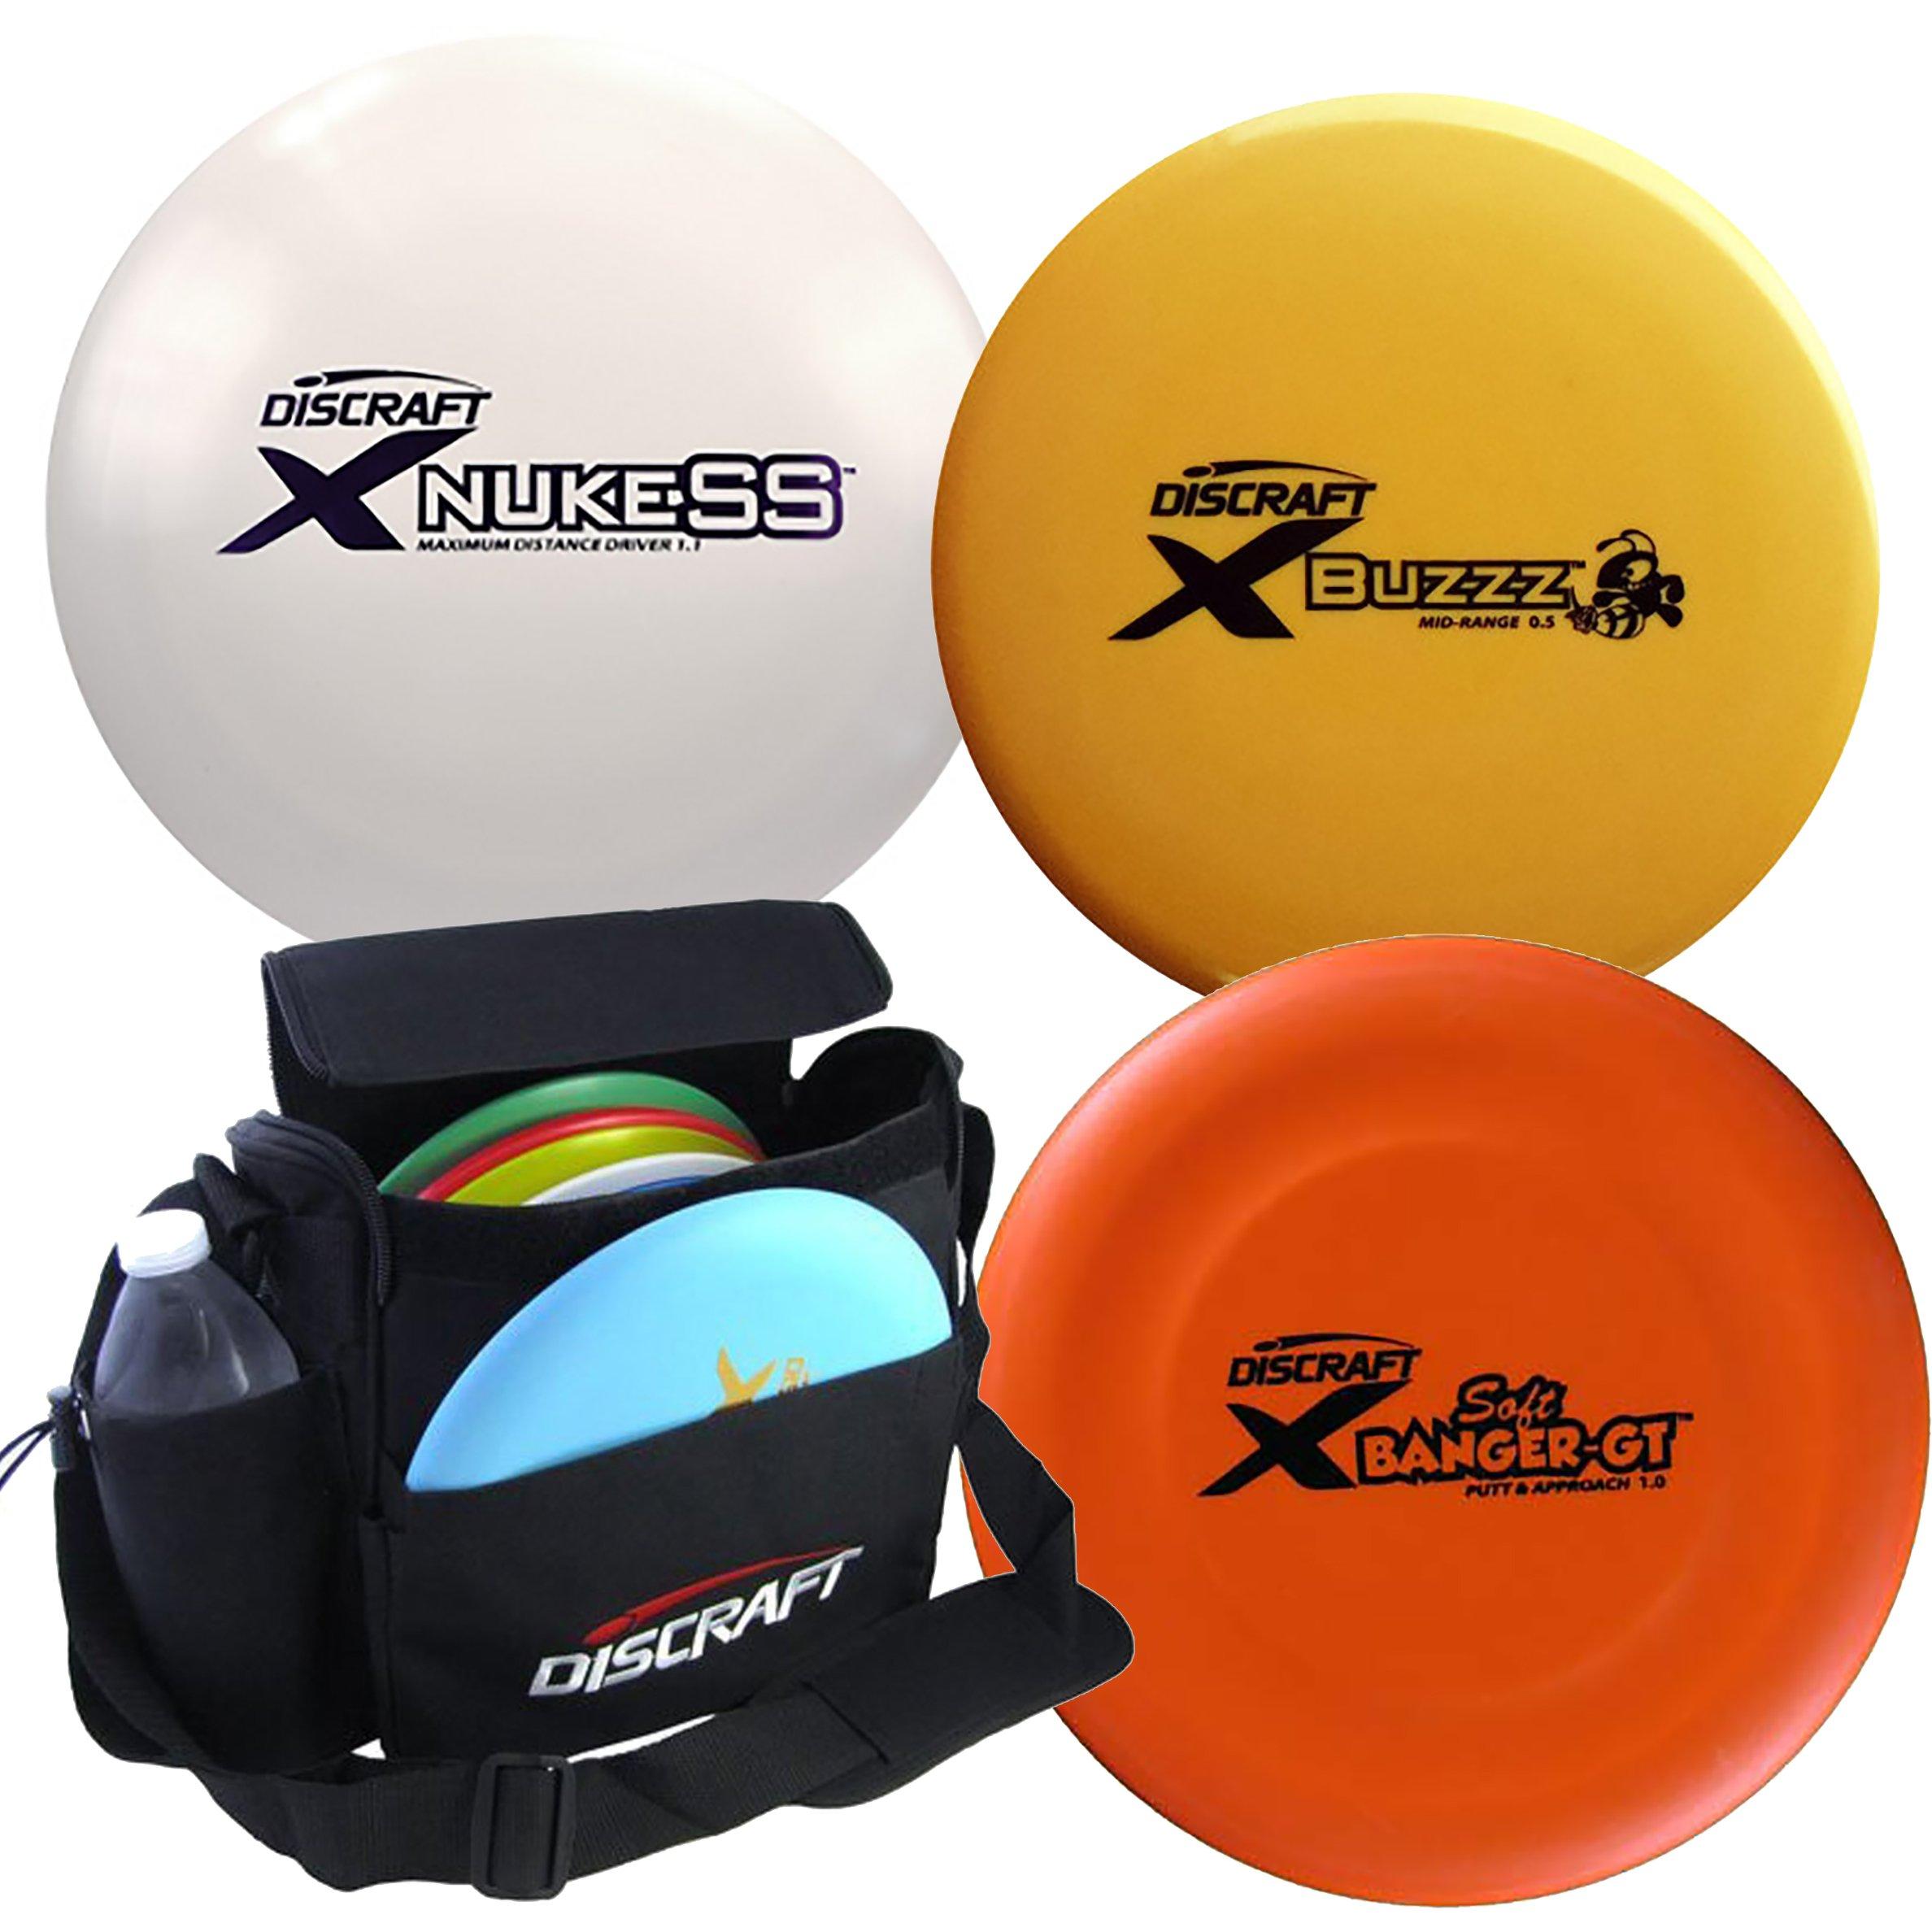 Discraft Disc Golf X Line Starter Package by Discraft